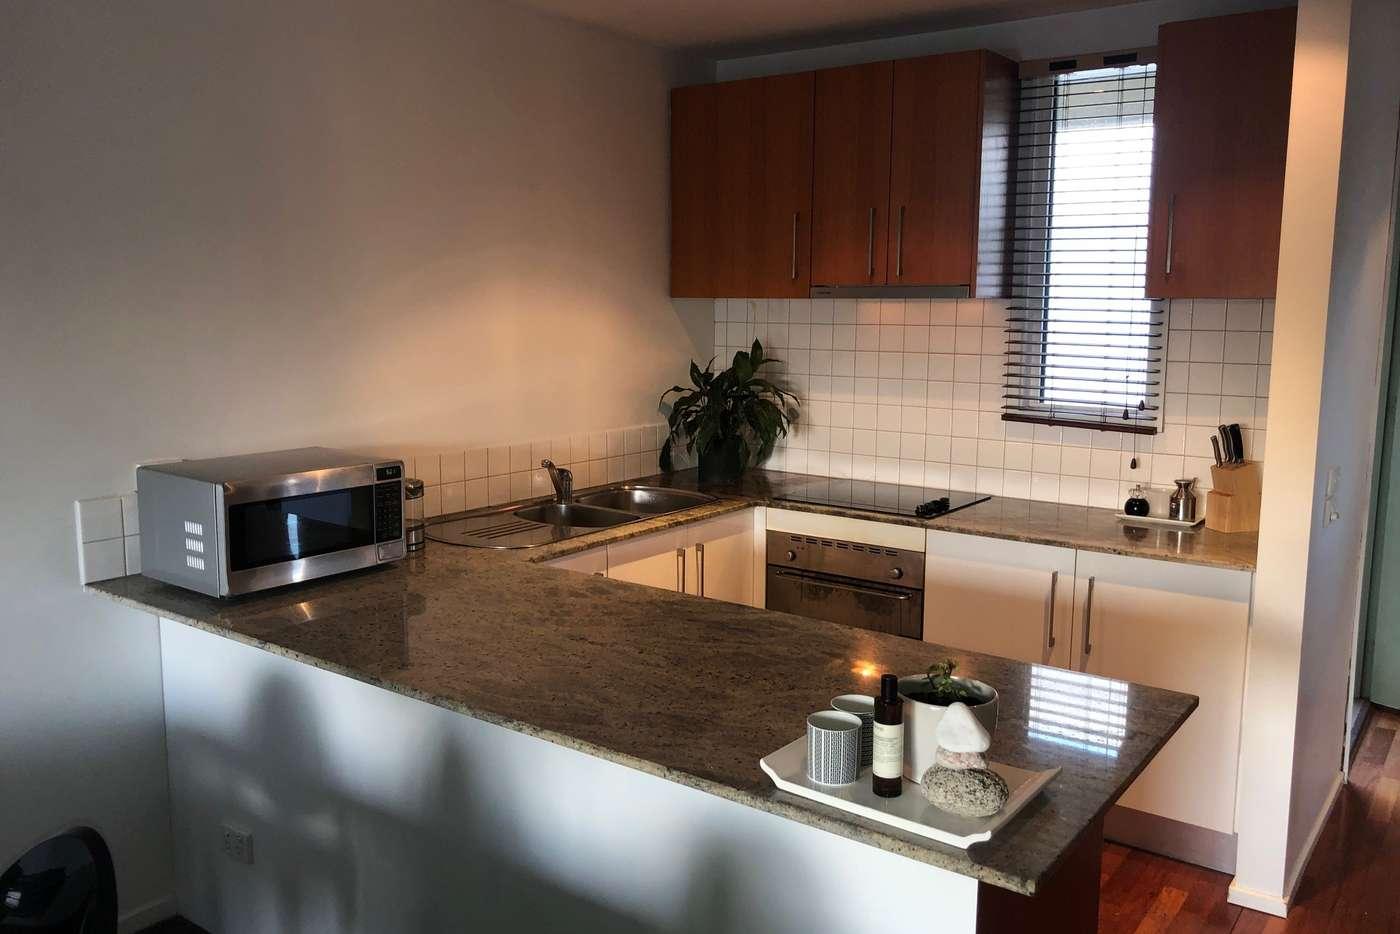 Main view of Homely apartment listing, 18/20 St Edmonds Road, Prahran VIC 3181